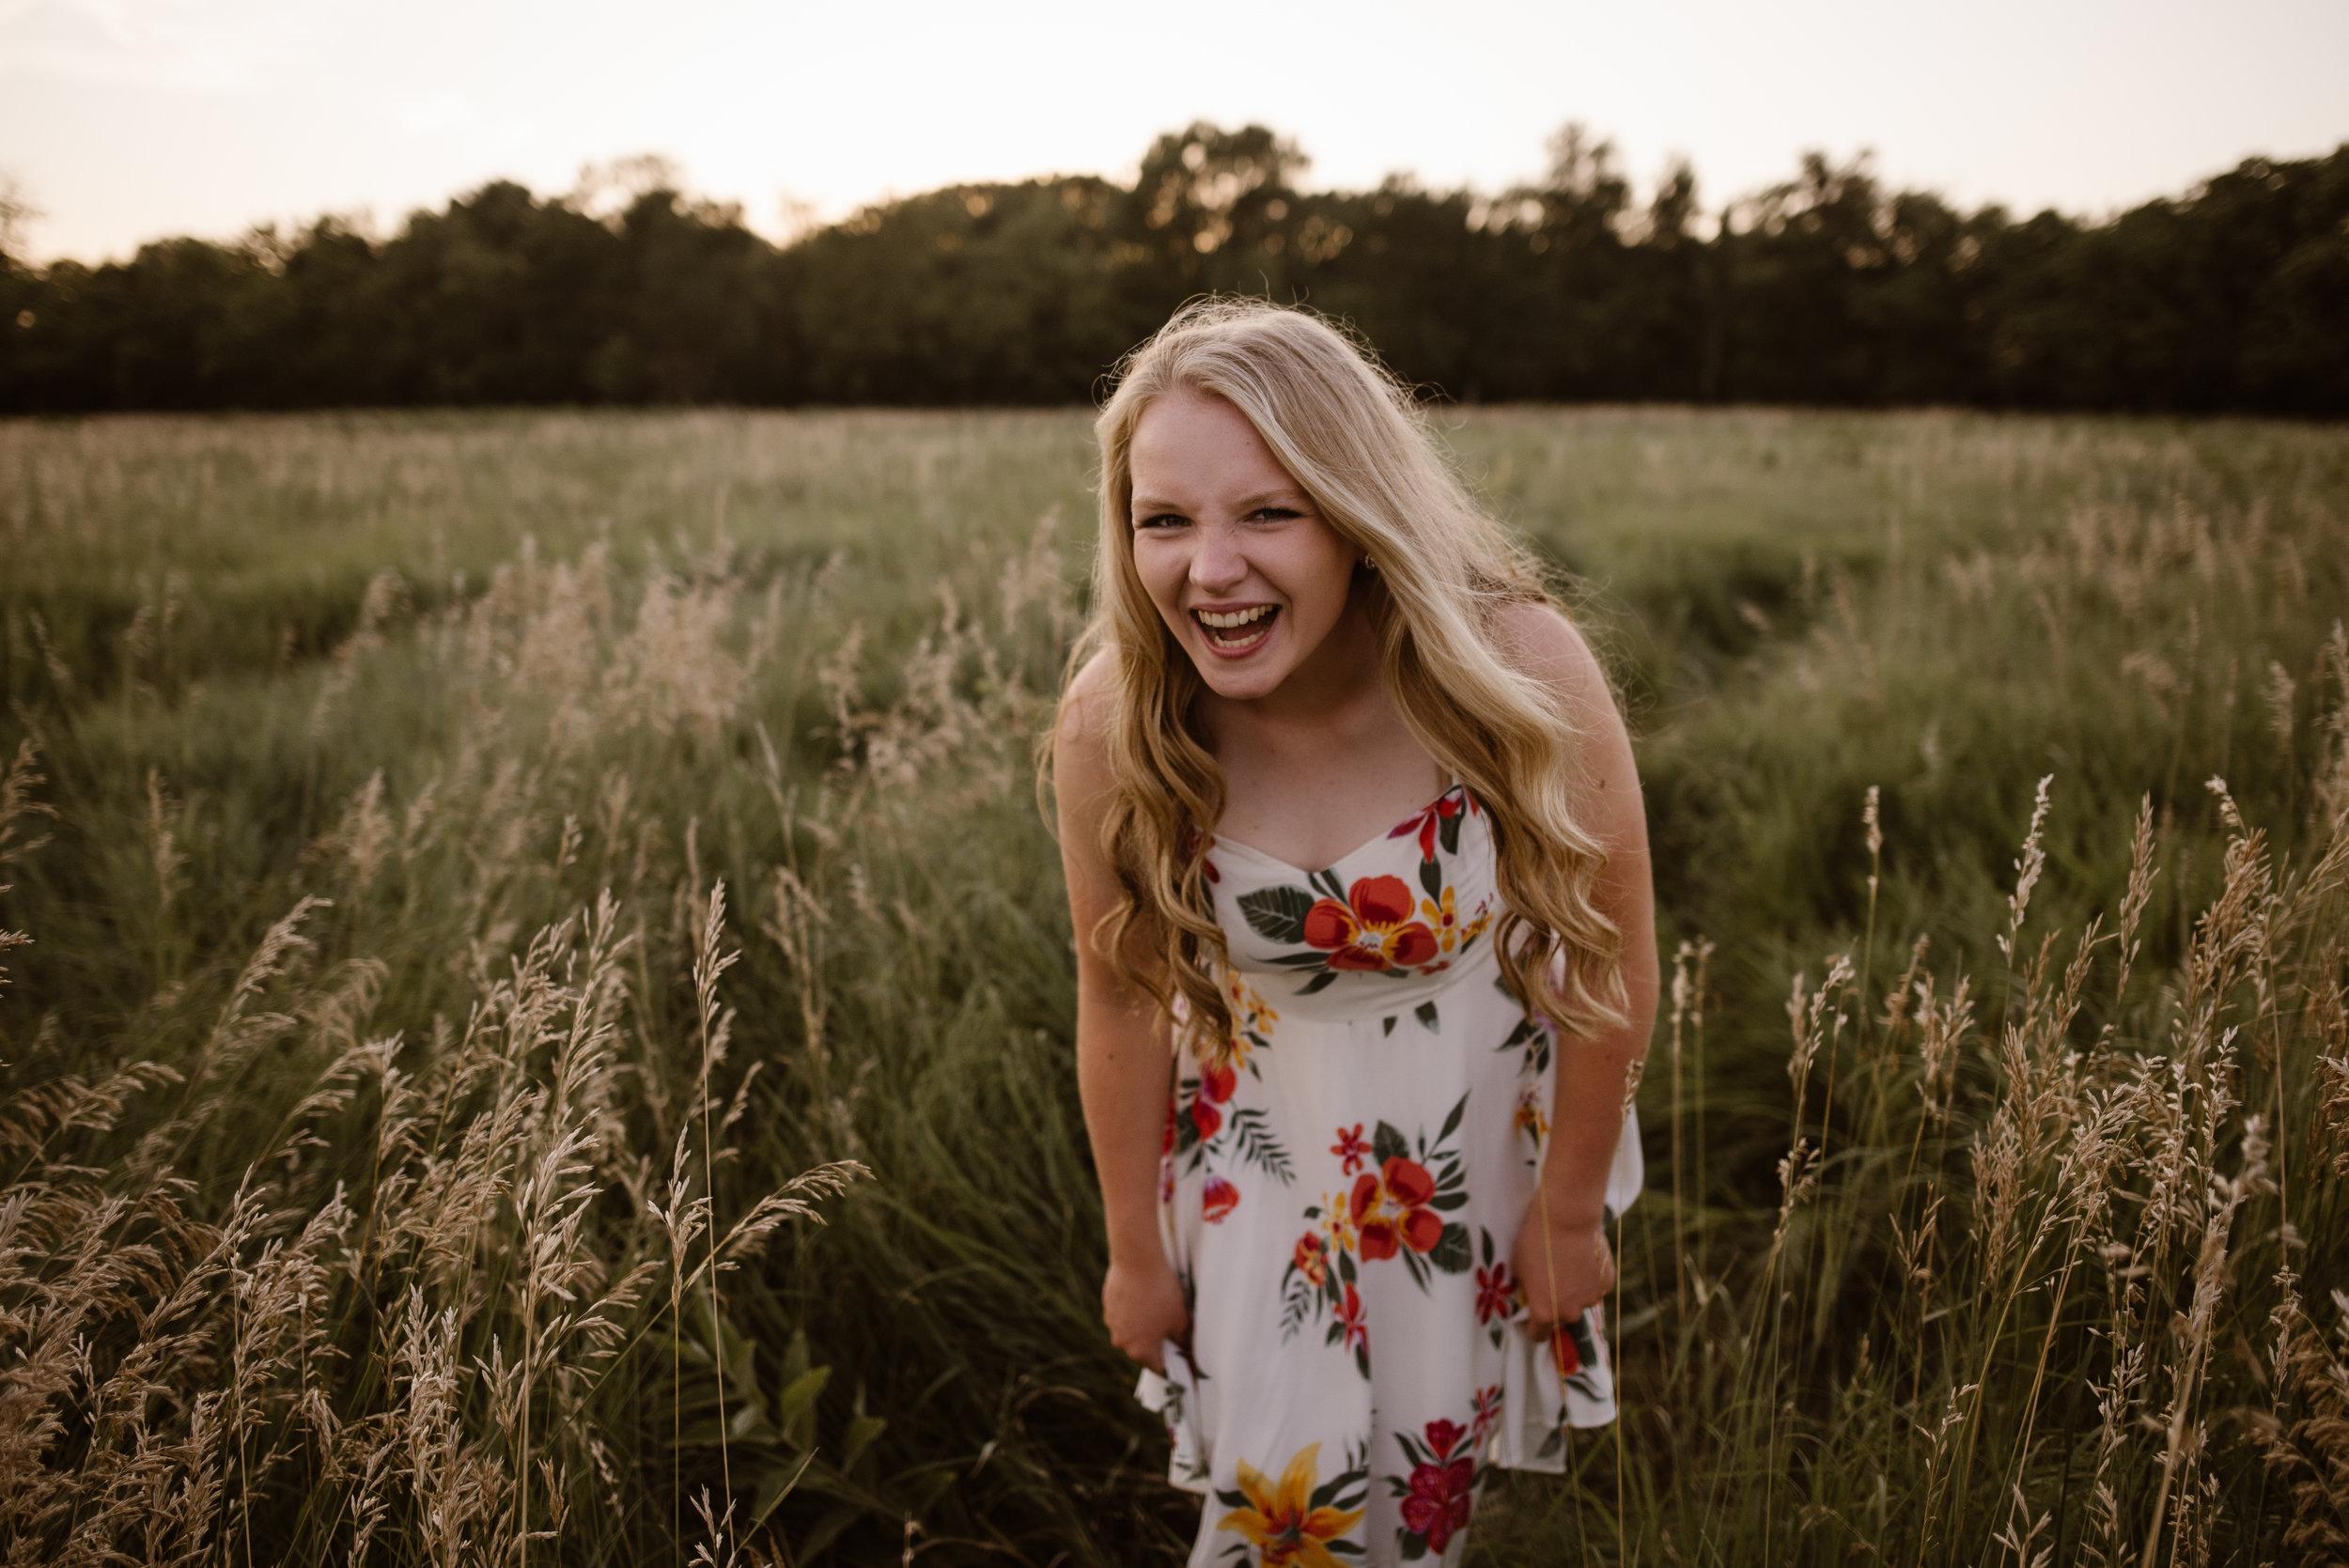 Kaylie-Sirek-Photography-Grand-Island-Nebraska-Senior-018.jpg